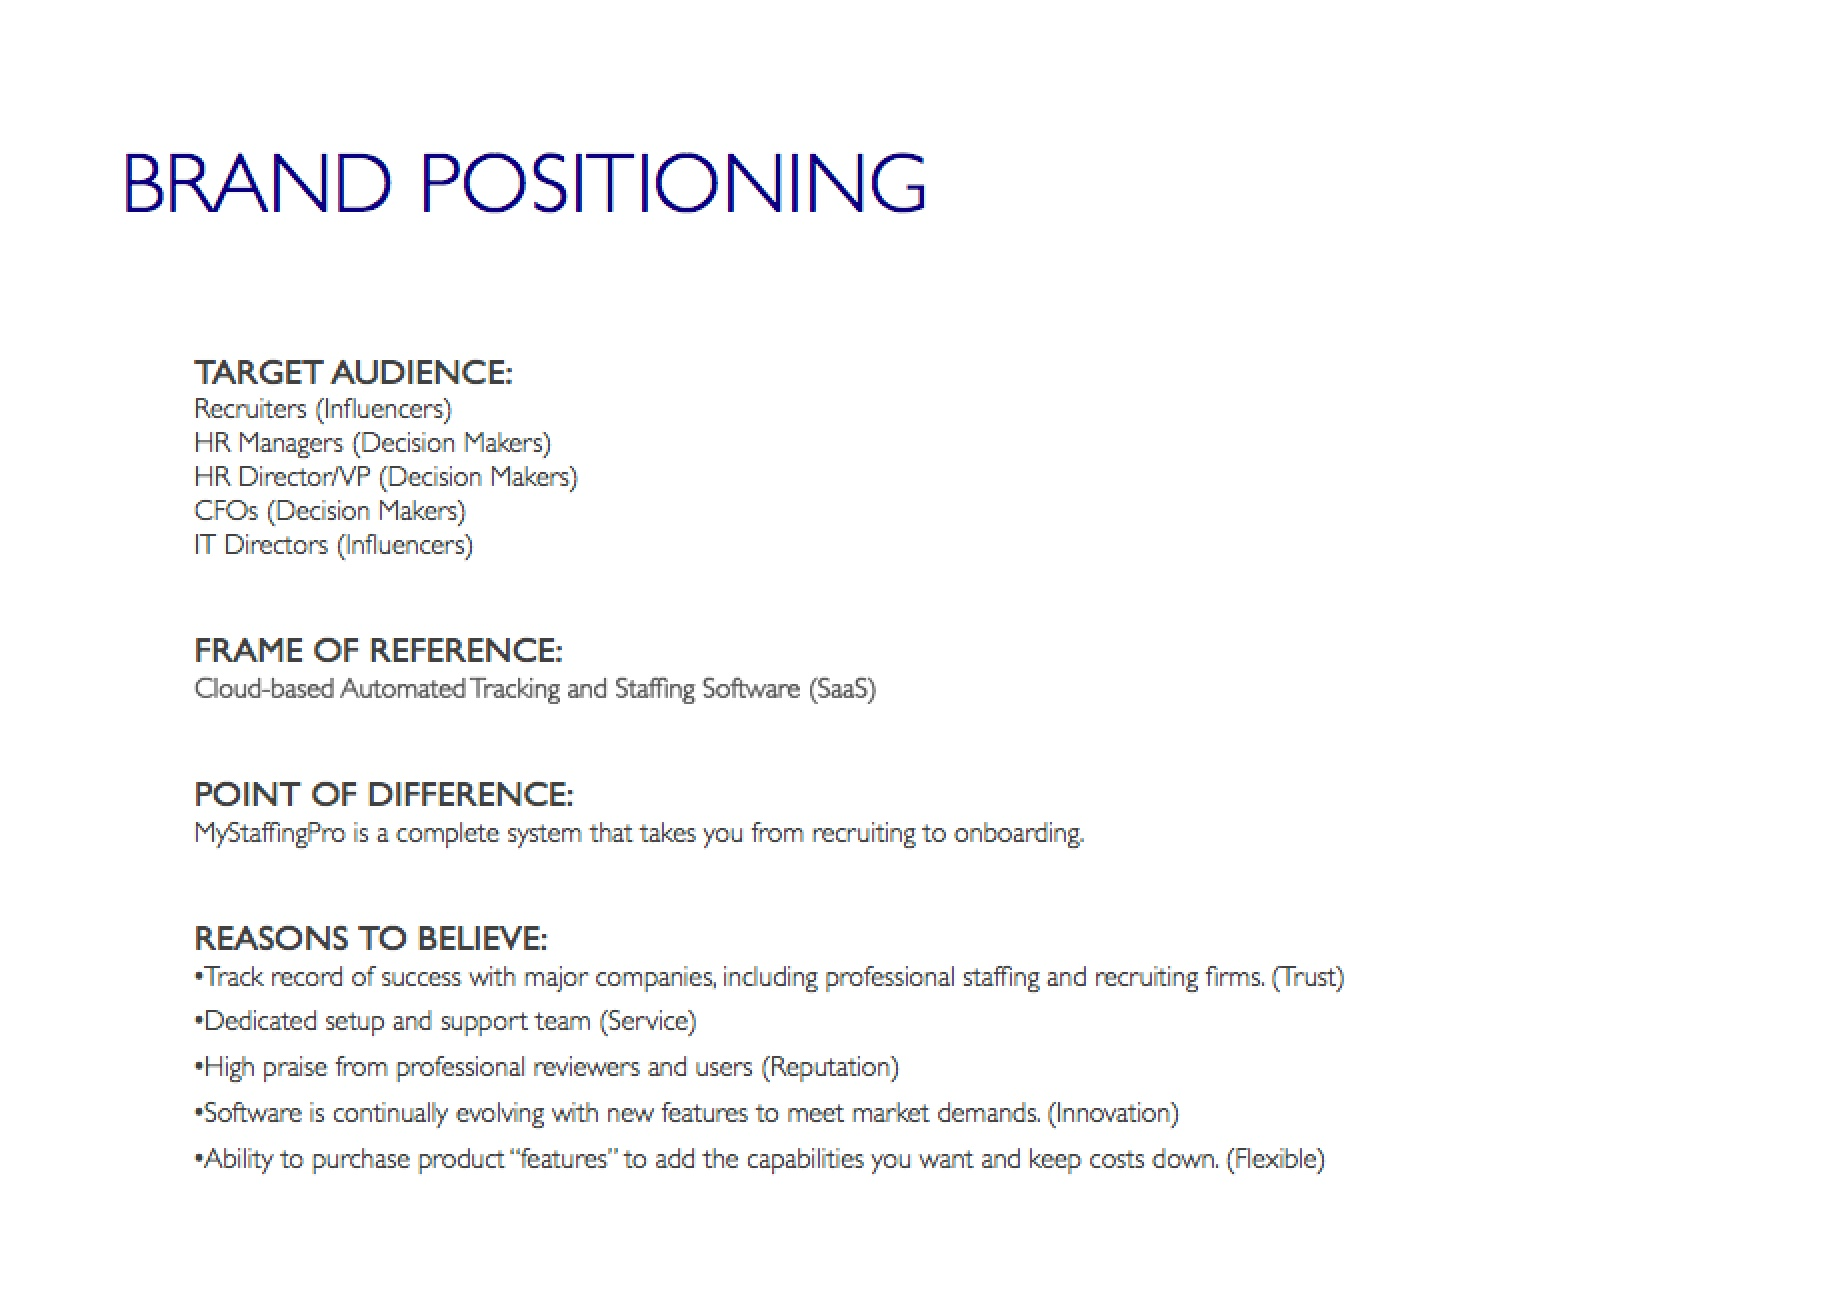 Brand Positioning slide.jpeg